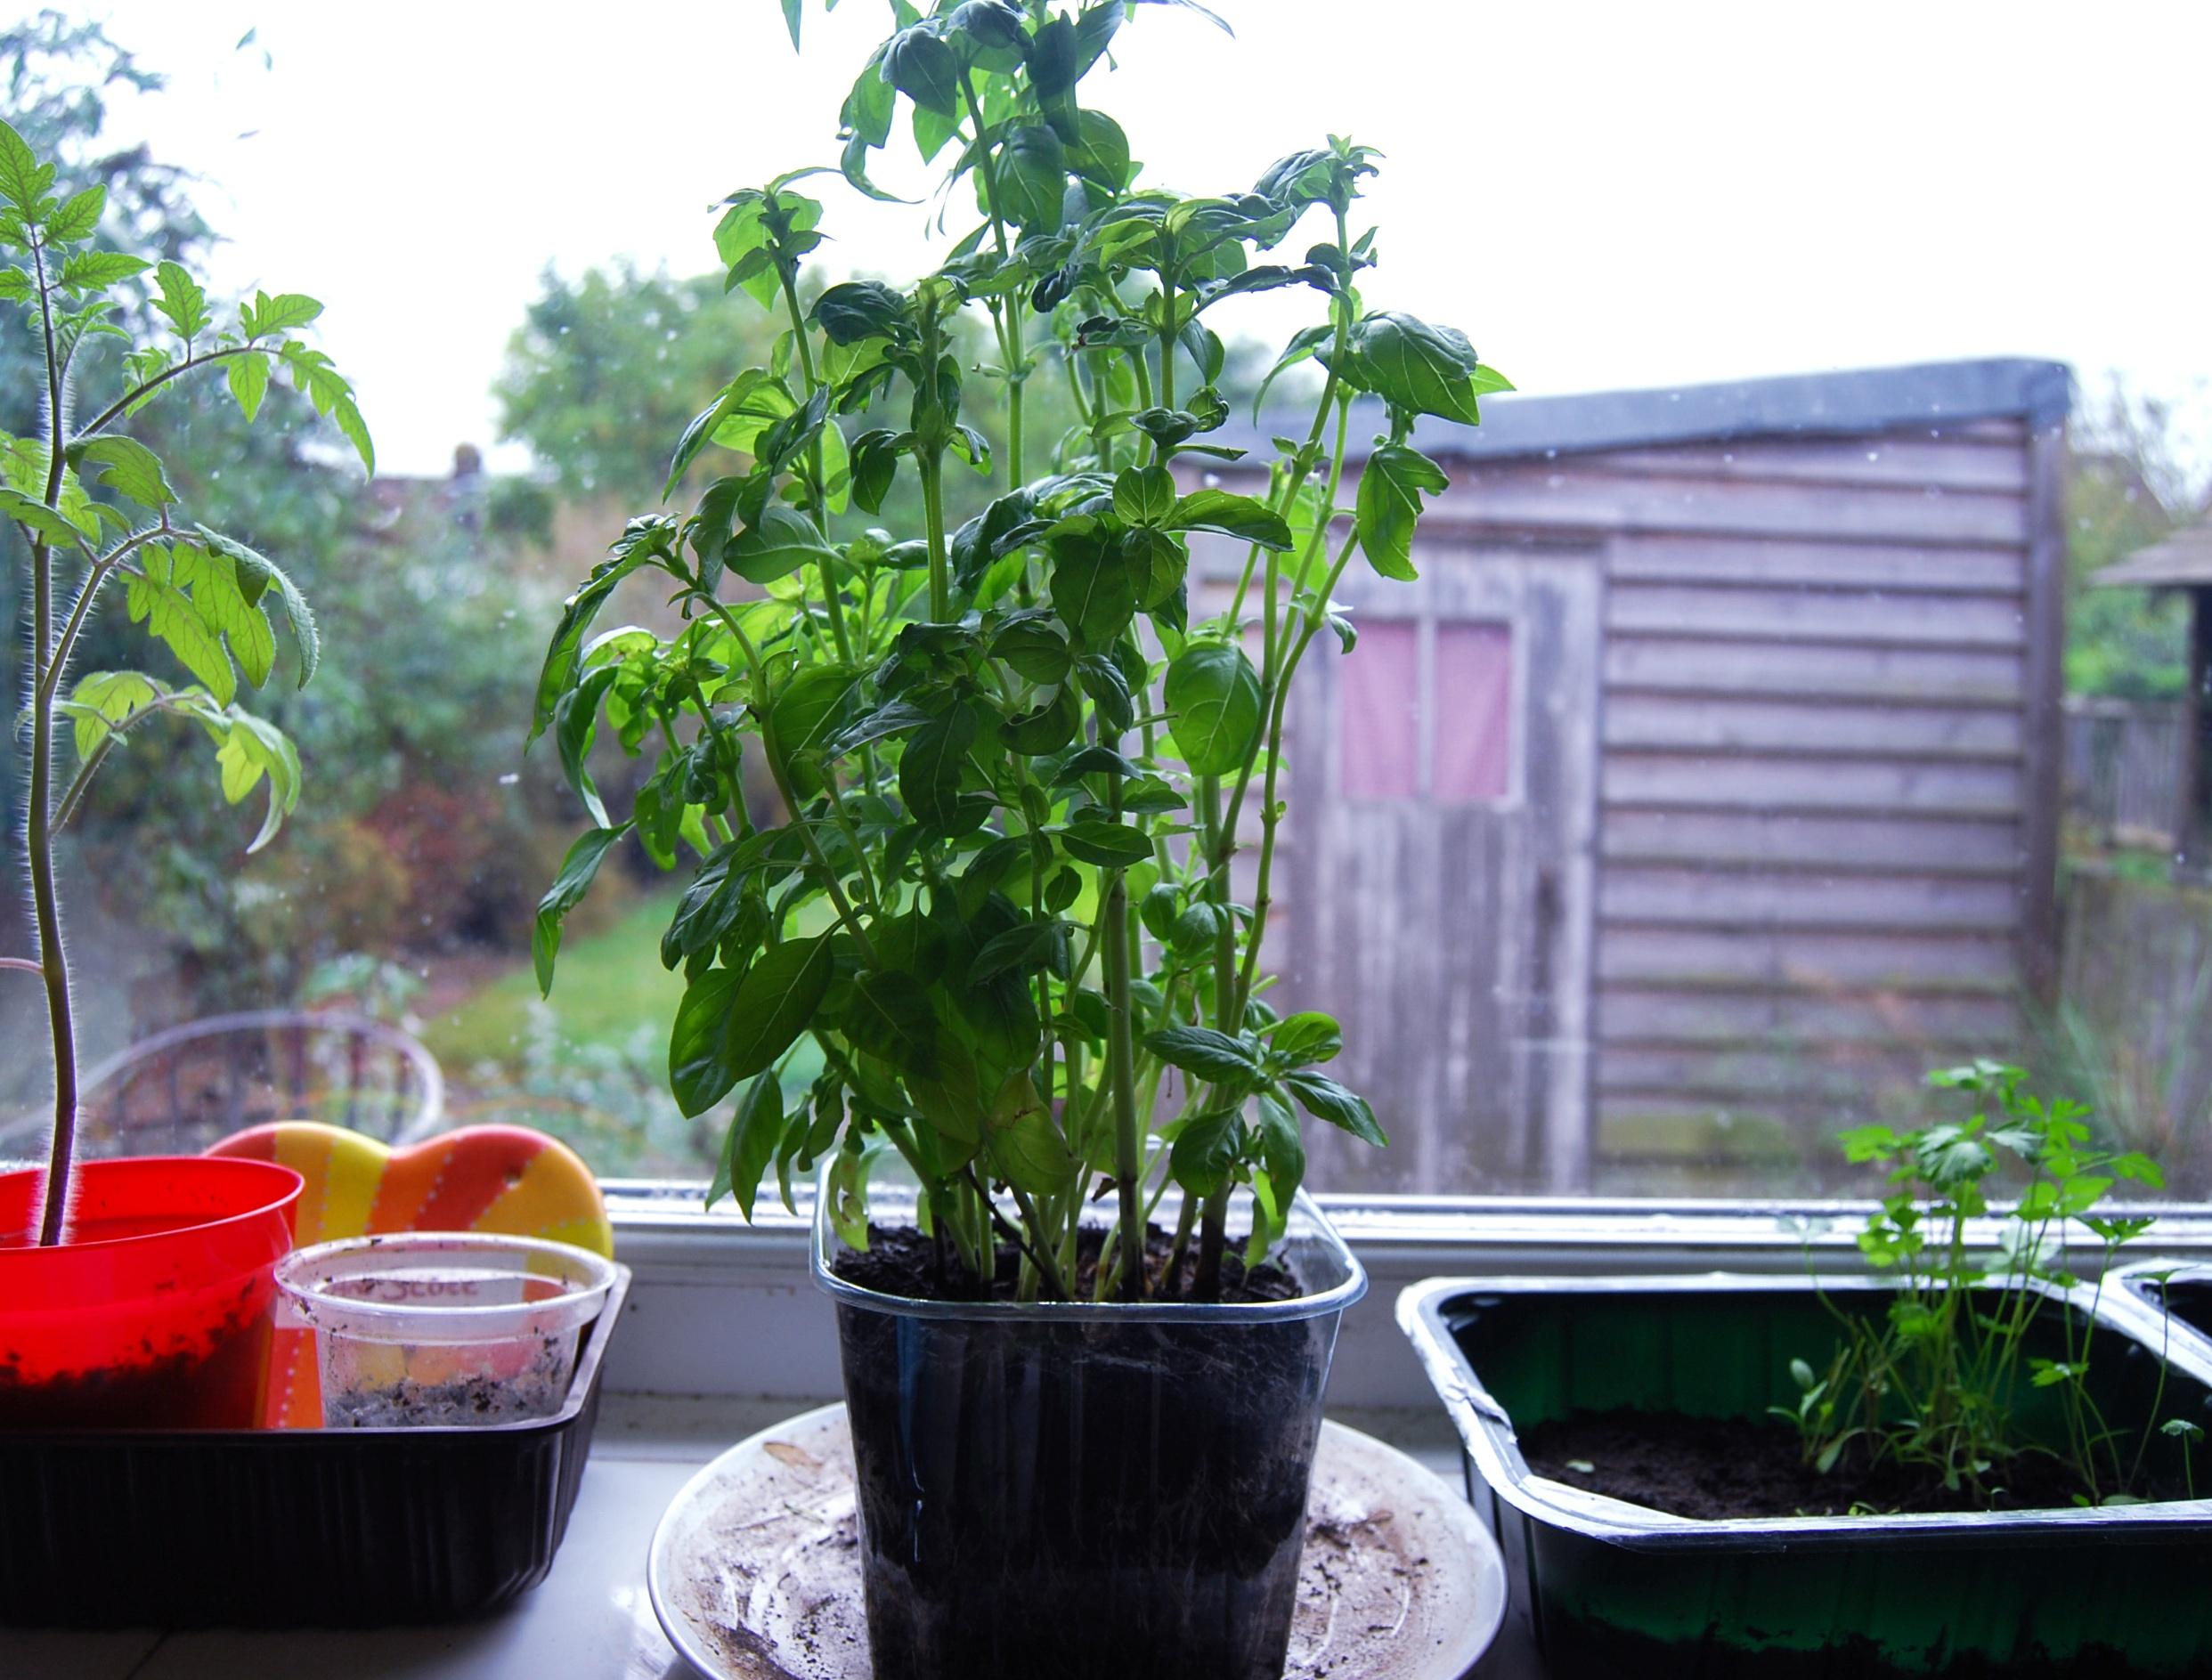 Kitchen Windowsill Herb Garden The Kitchen Window Sill Update And Some Advice Needed Veghotpot